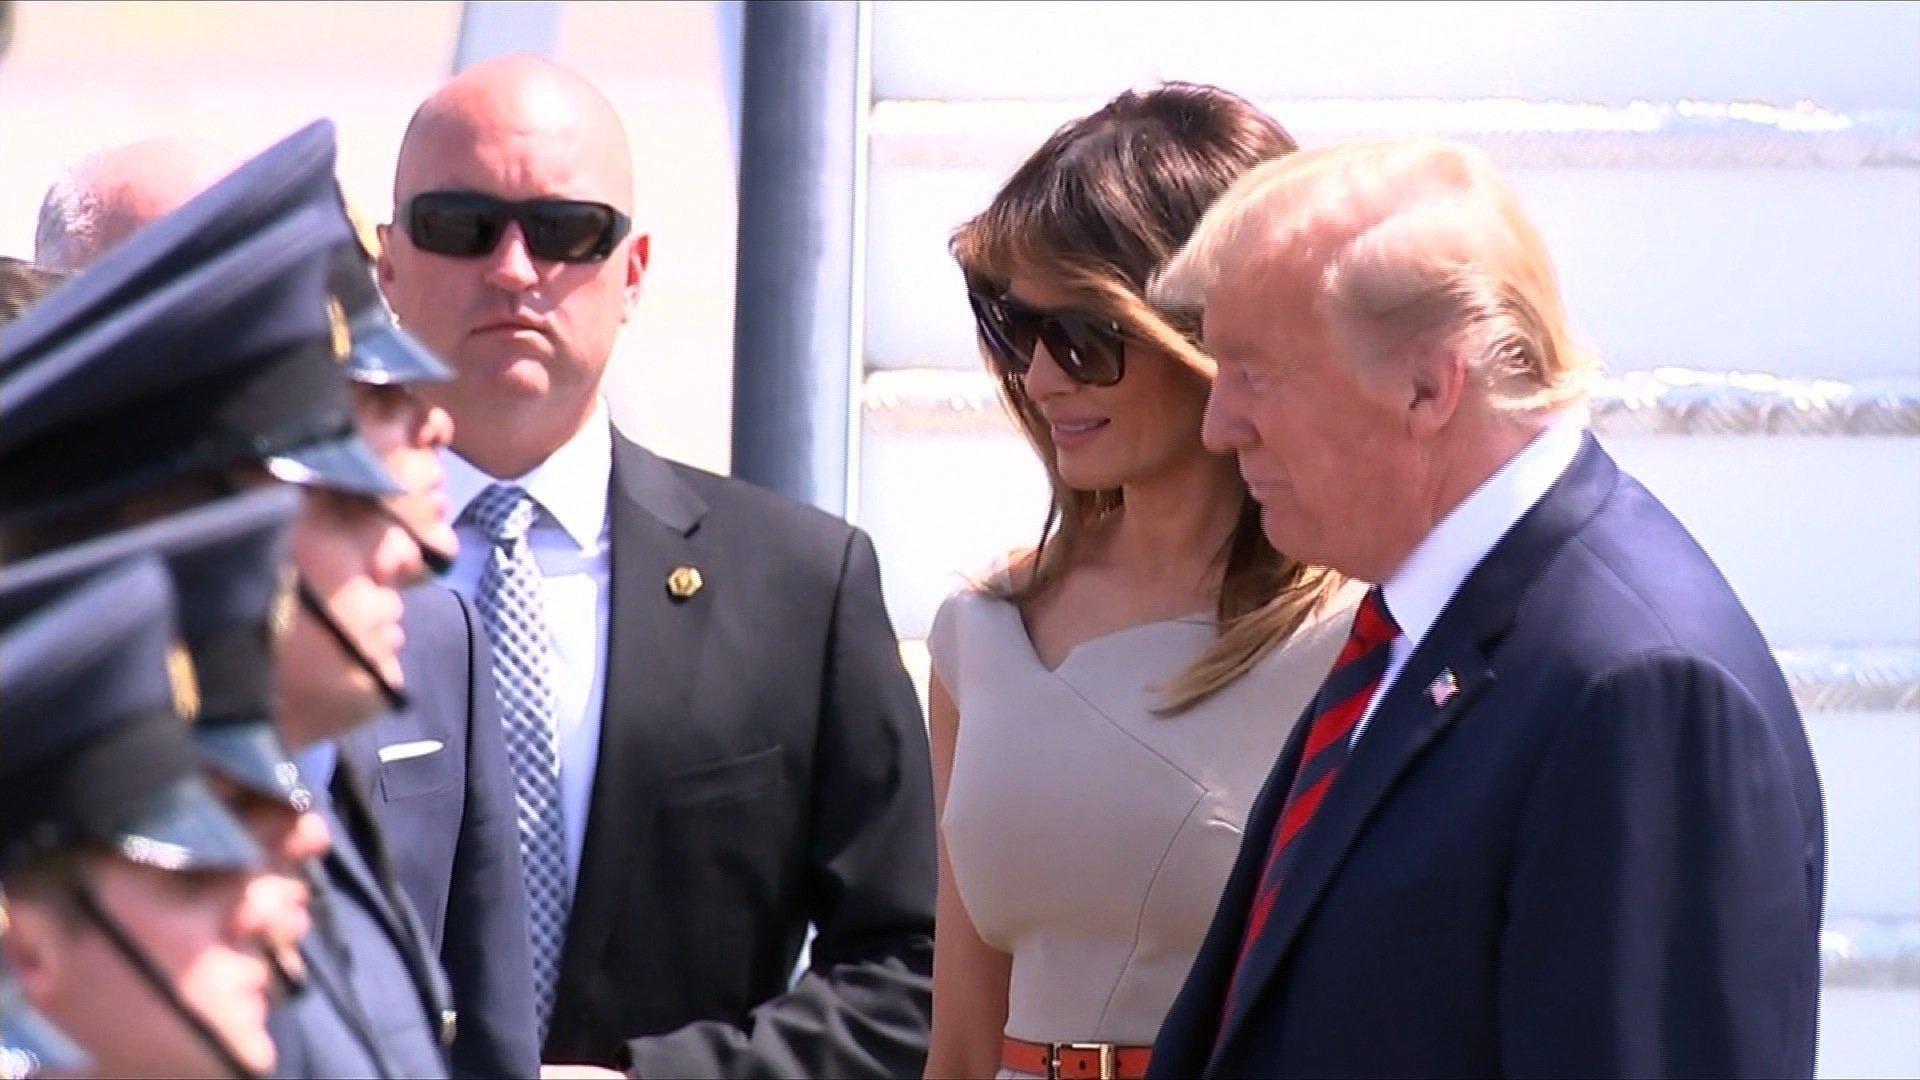 Donald Trump and Melania Trump arrive in London on Thursday.